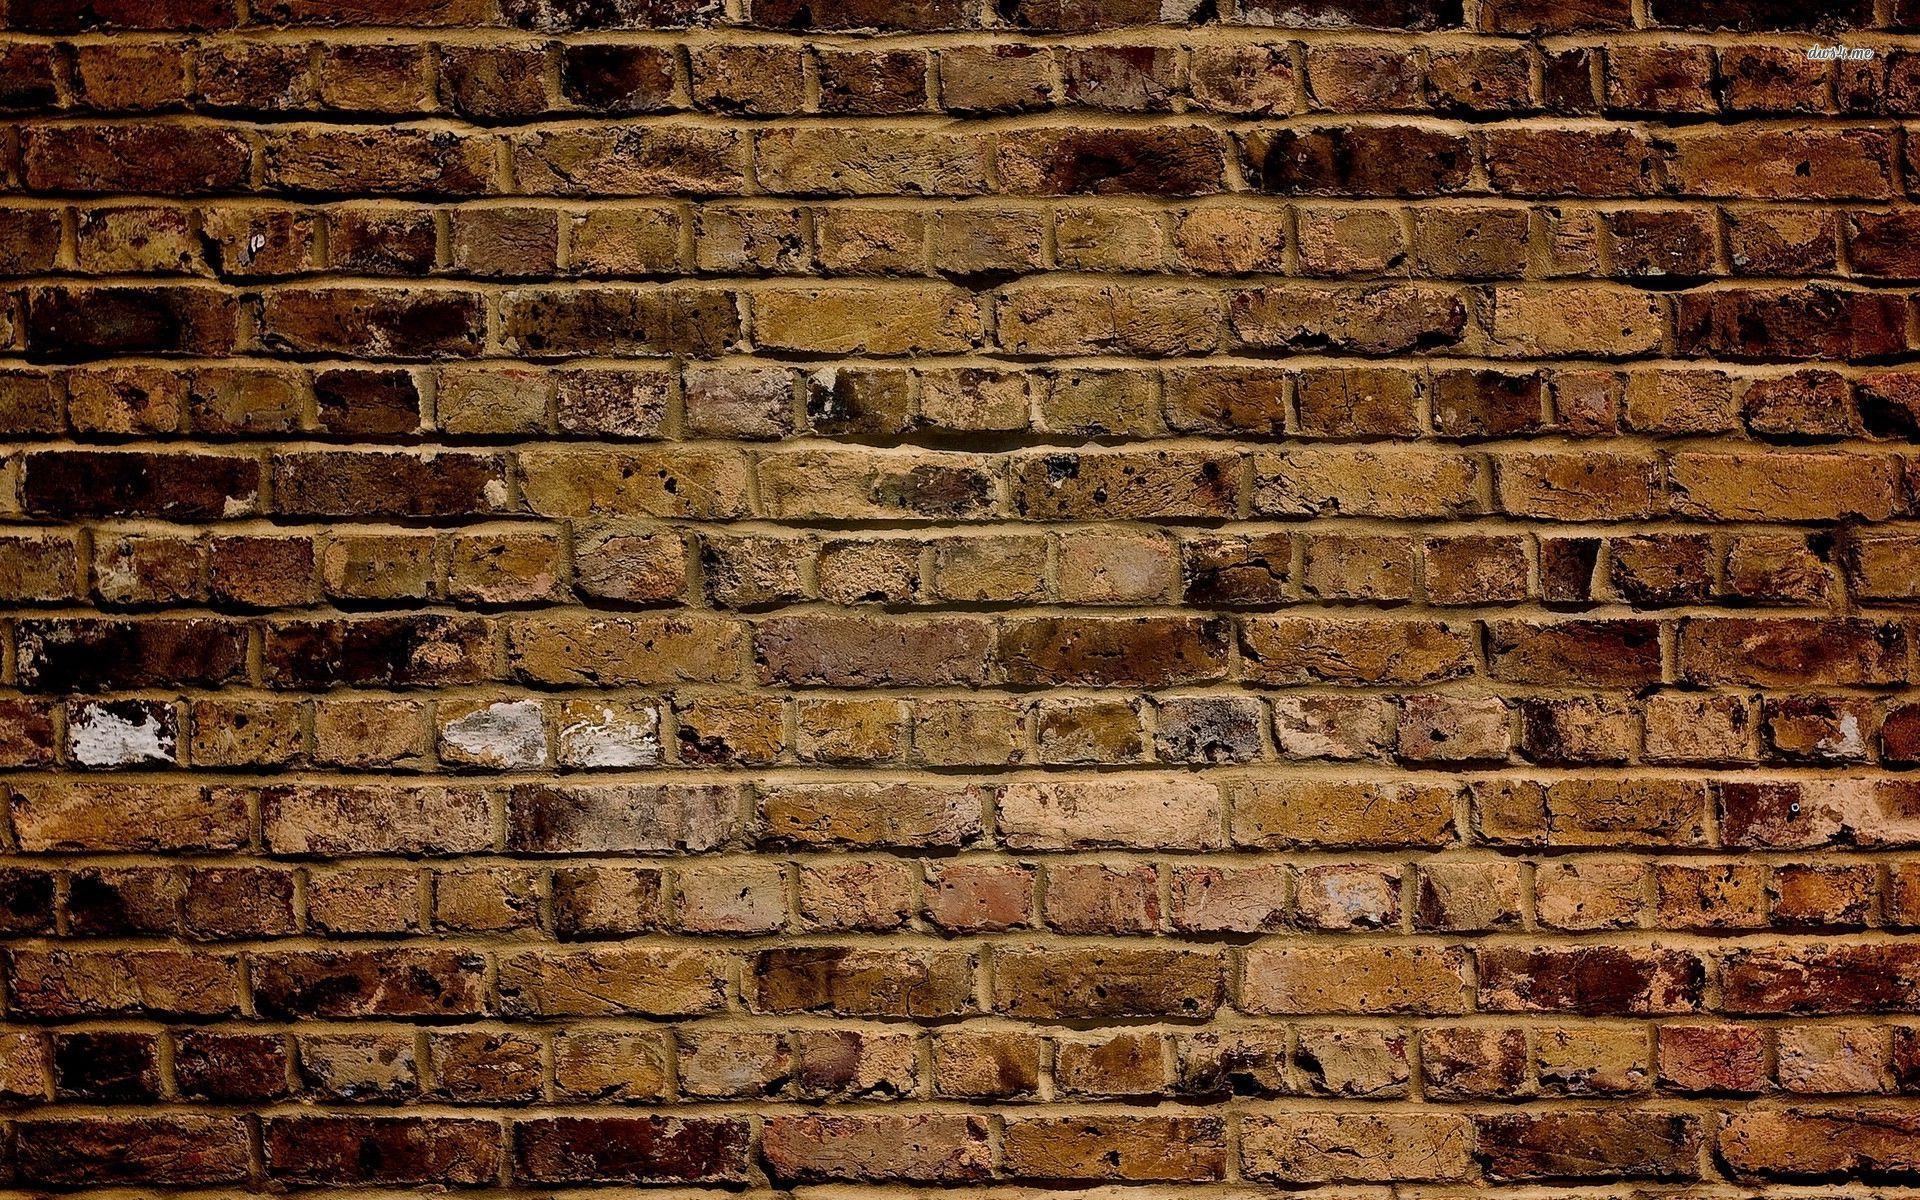 Brick Wall Wallpaper 2560x1600 More46 Background Brick Wall Jpg 1920x1200